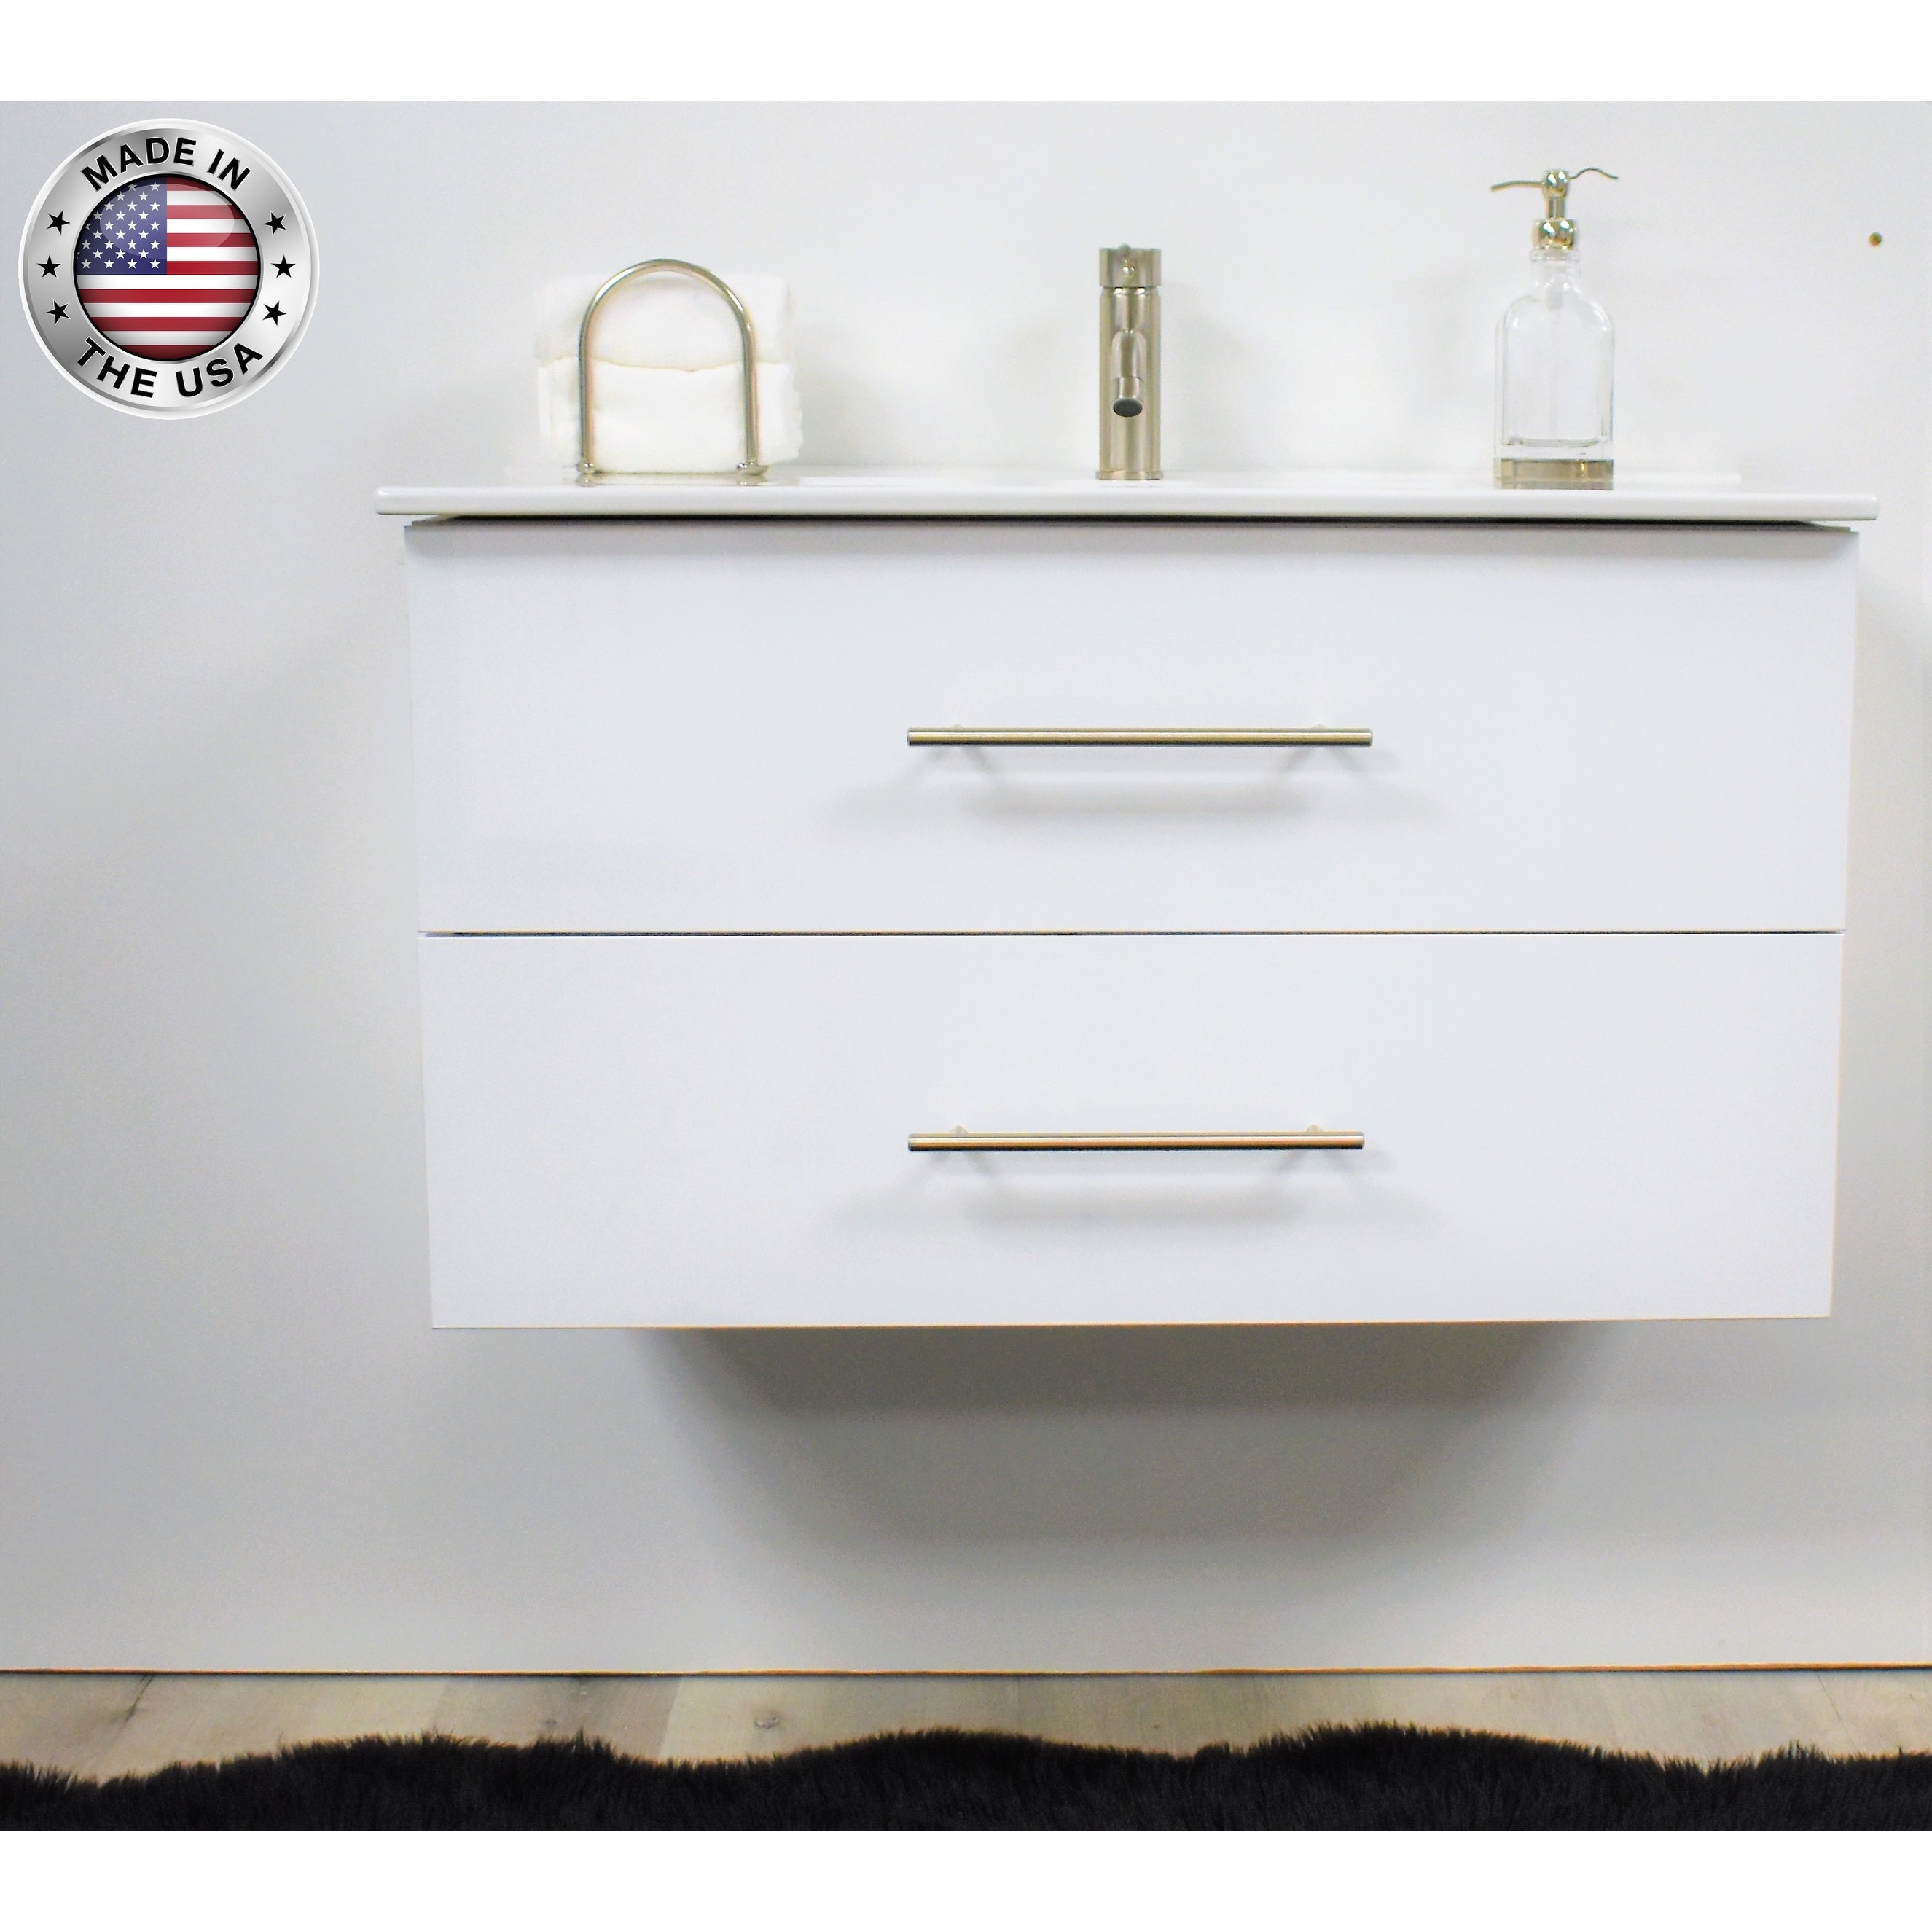 Volpa Usa Napa 30 Inch Glossy White Wall Mounted Floating Bathroom Vanity Set Overstock 32207291